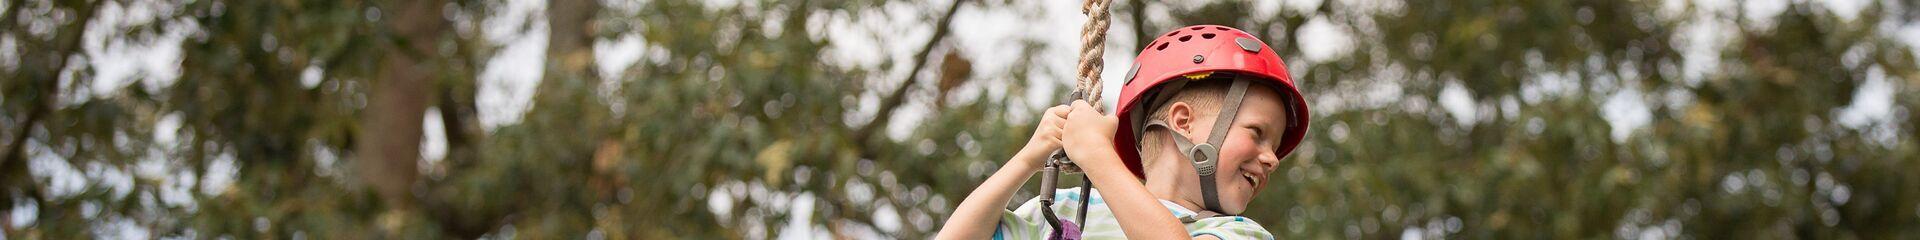 Charlotte's YMCA camp Thunderbird field trip teacher resources for teacher planning